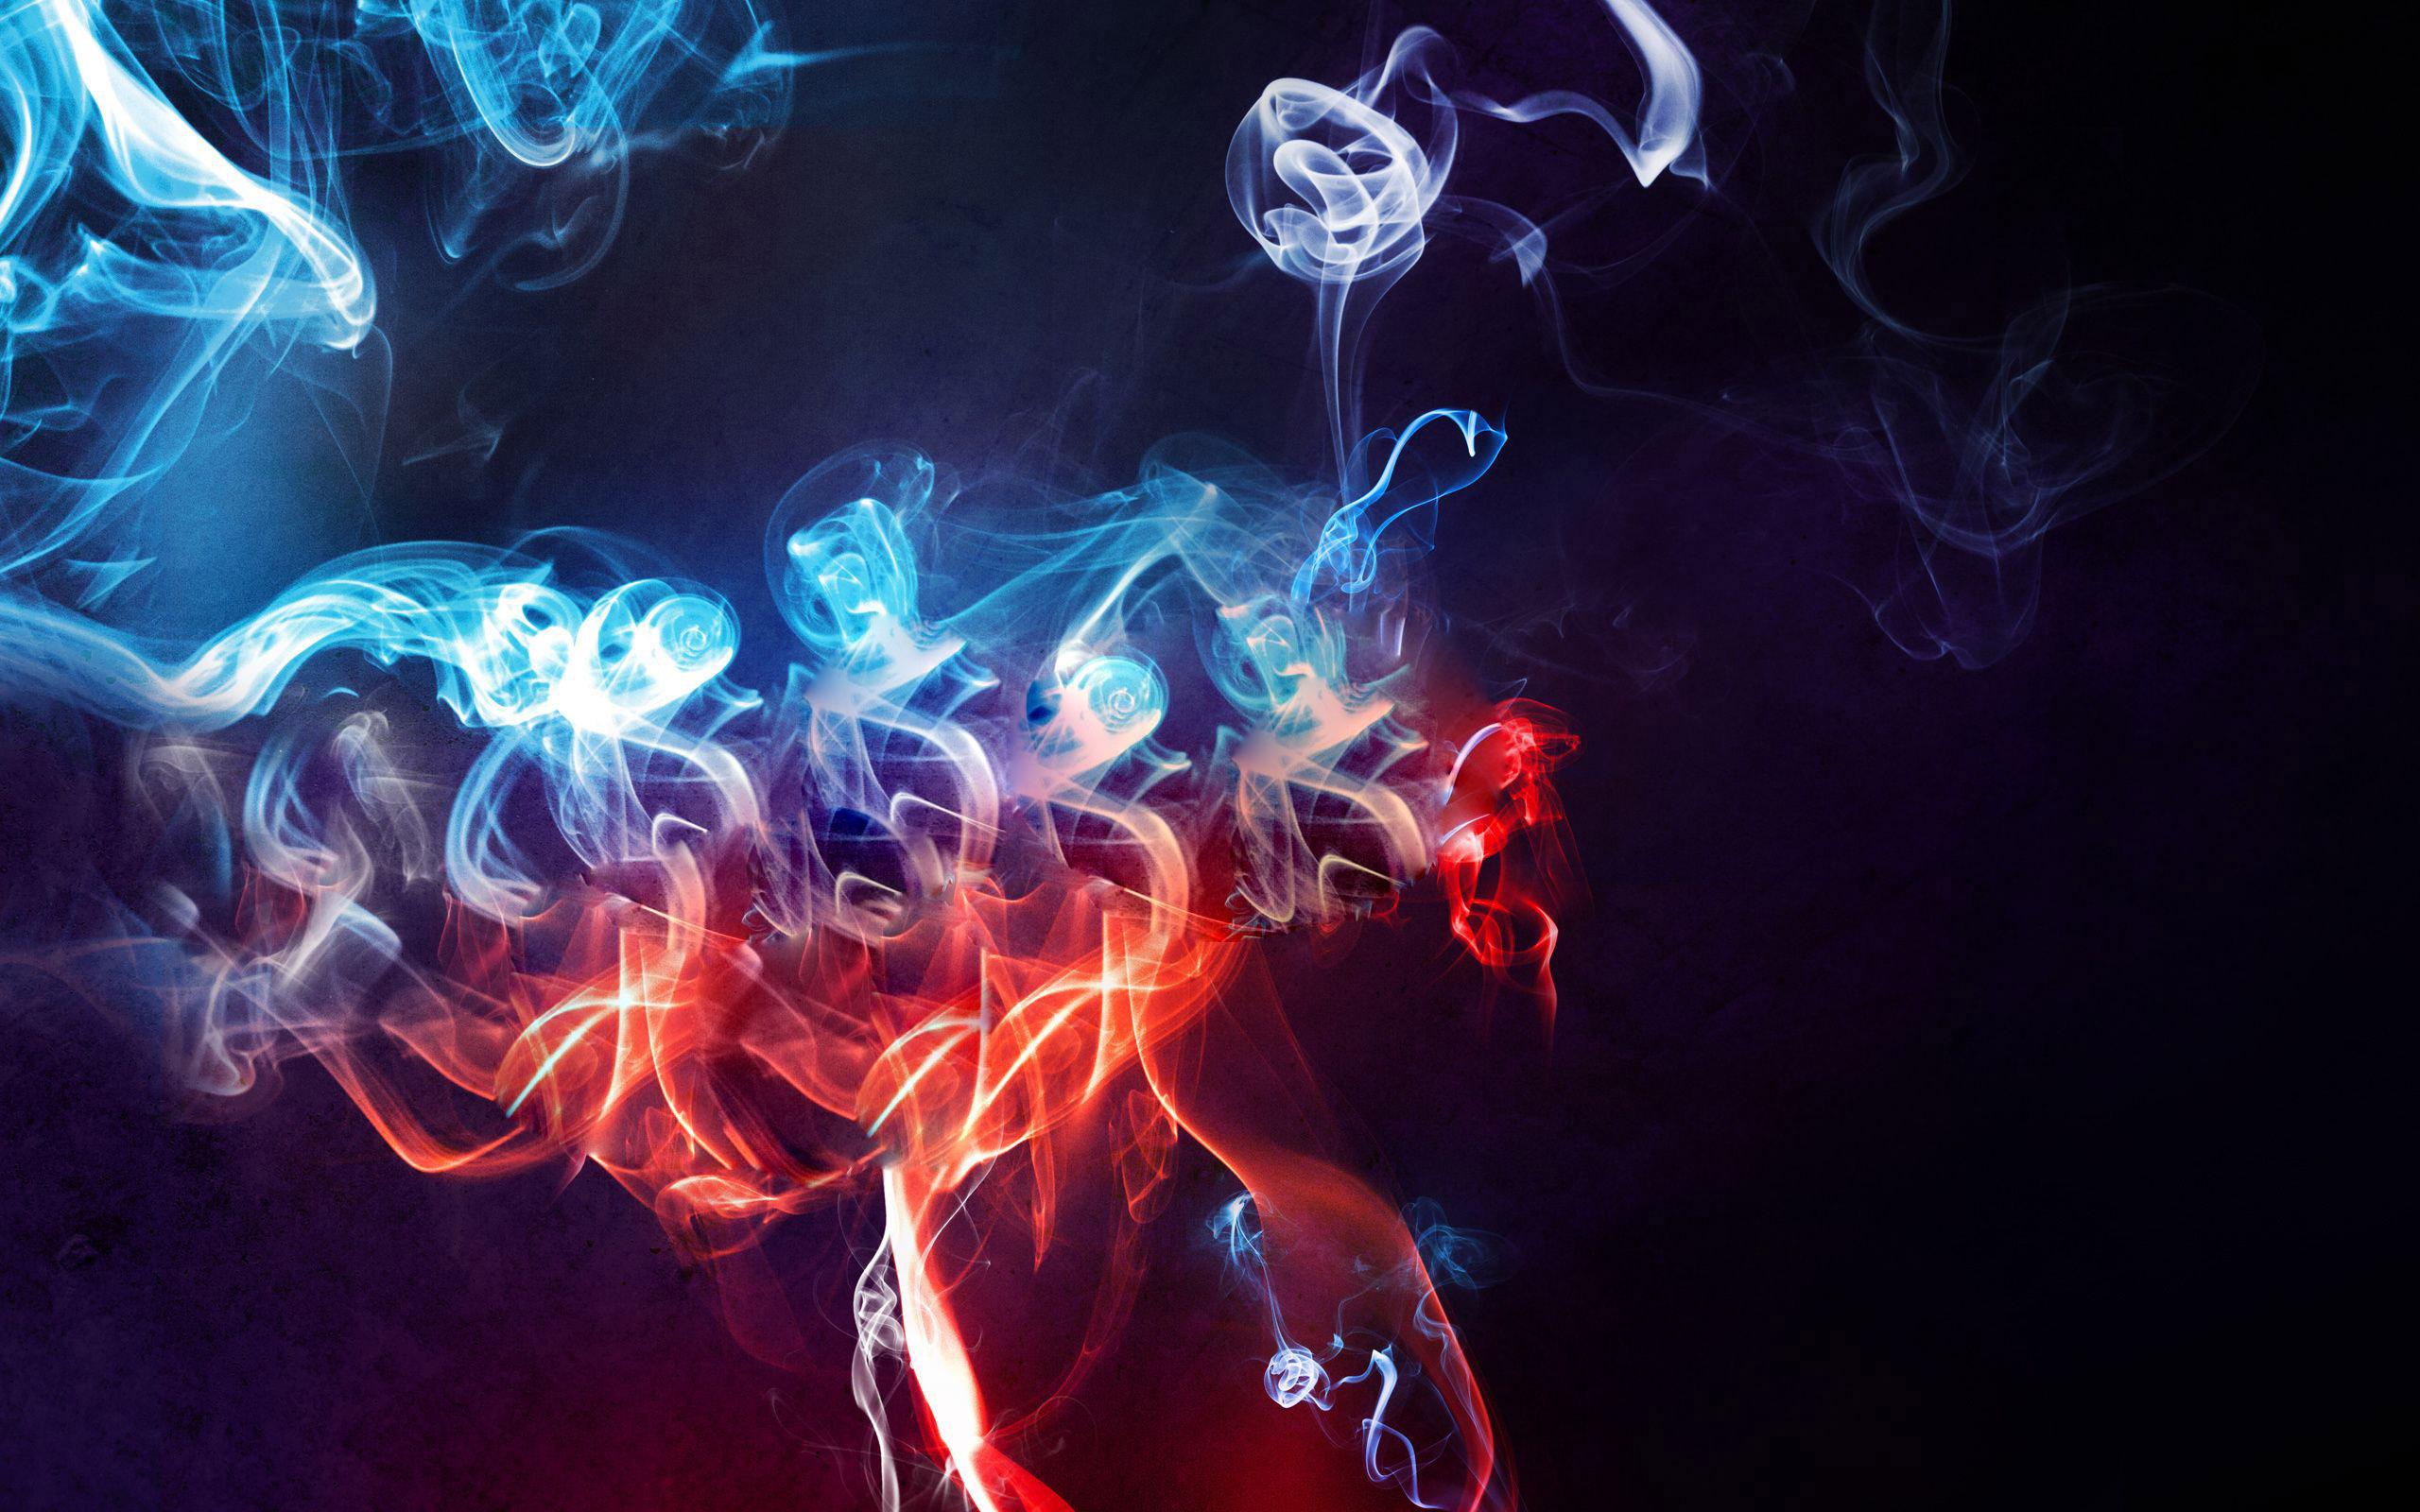 Colorful Smoke Backgrounds - WallpaperSafari